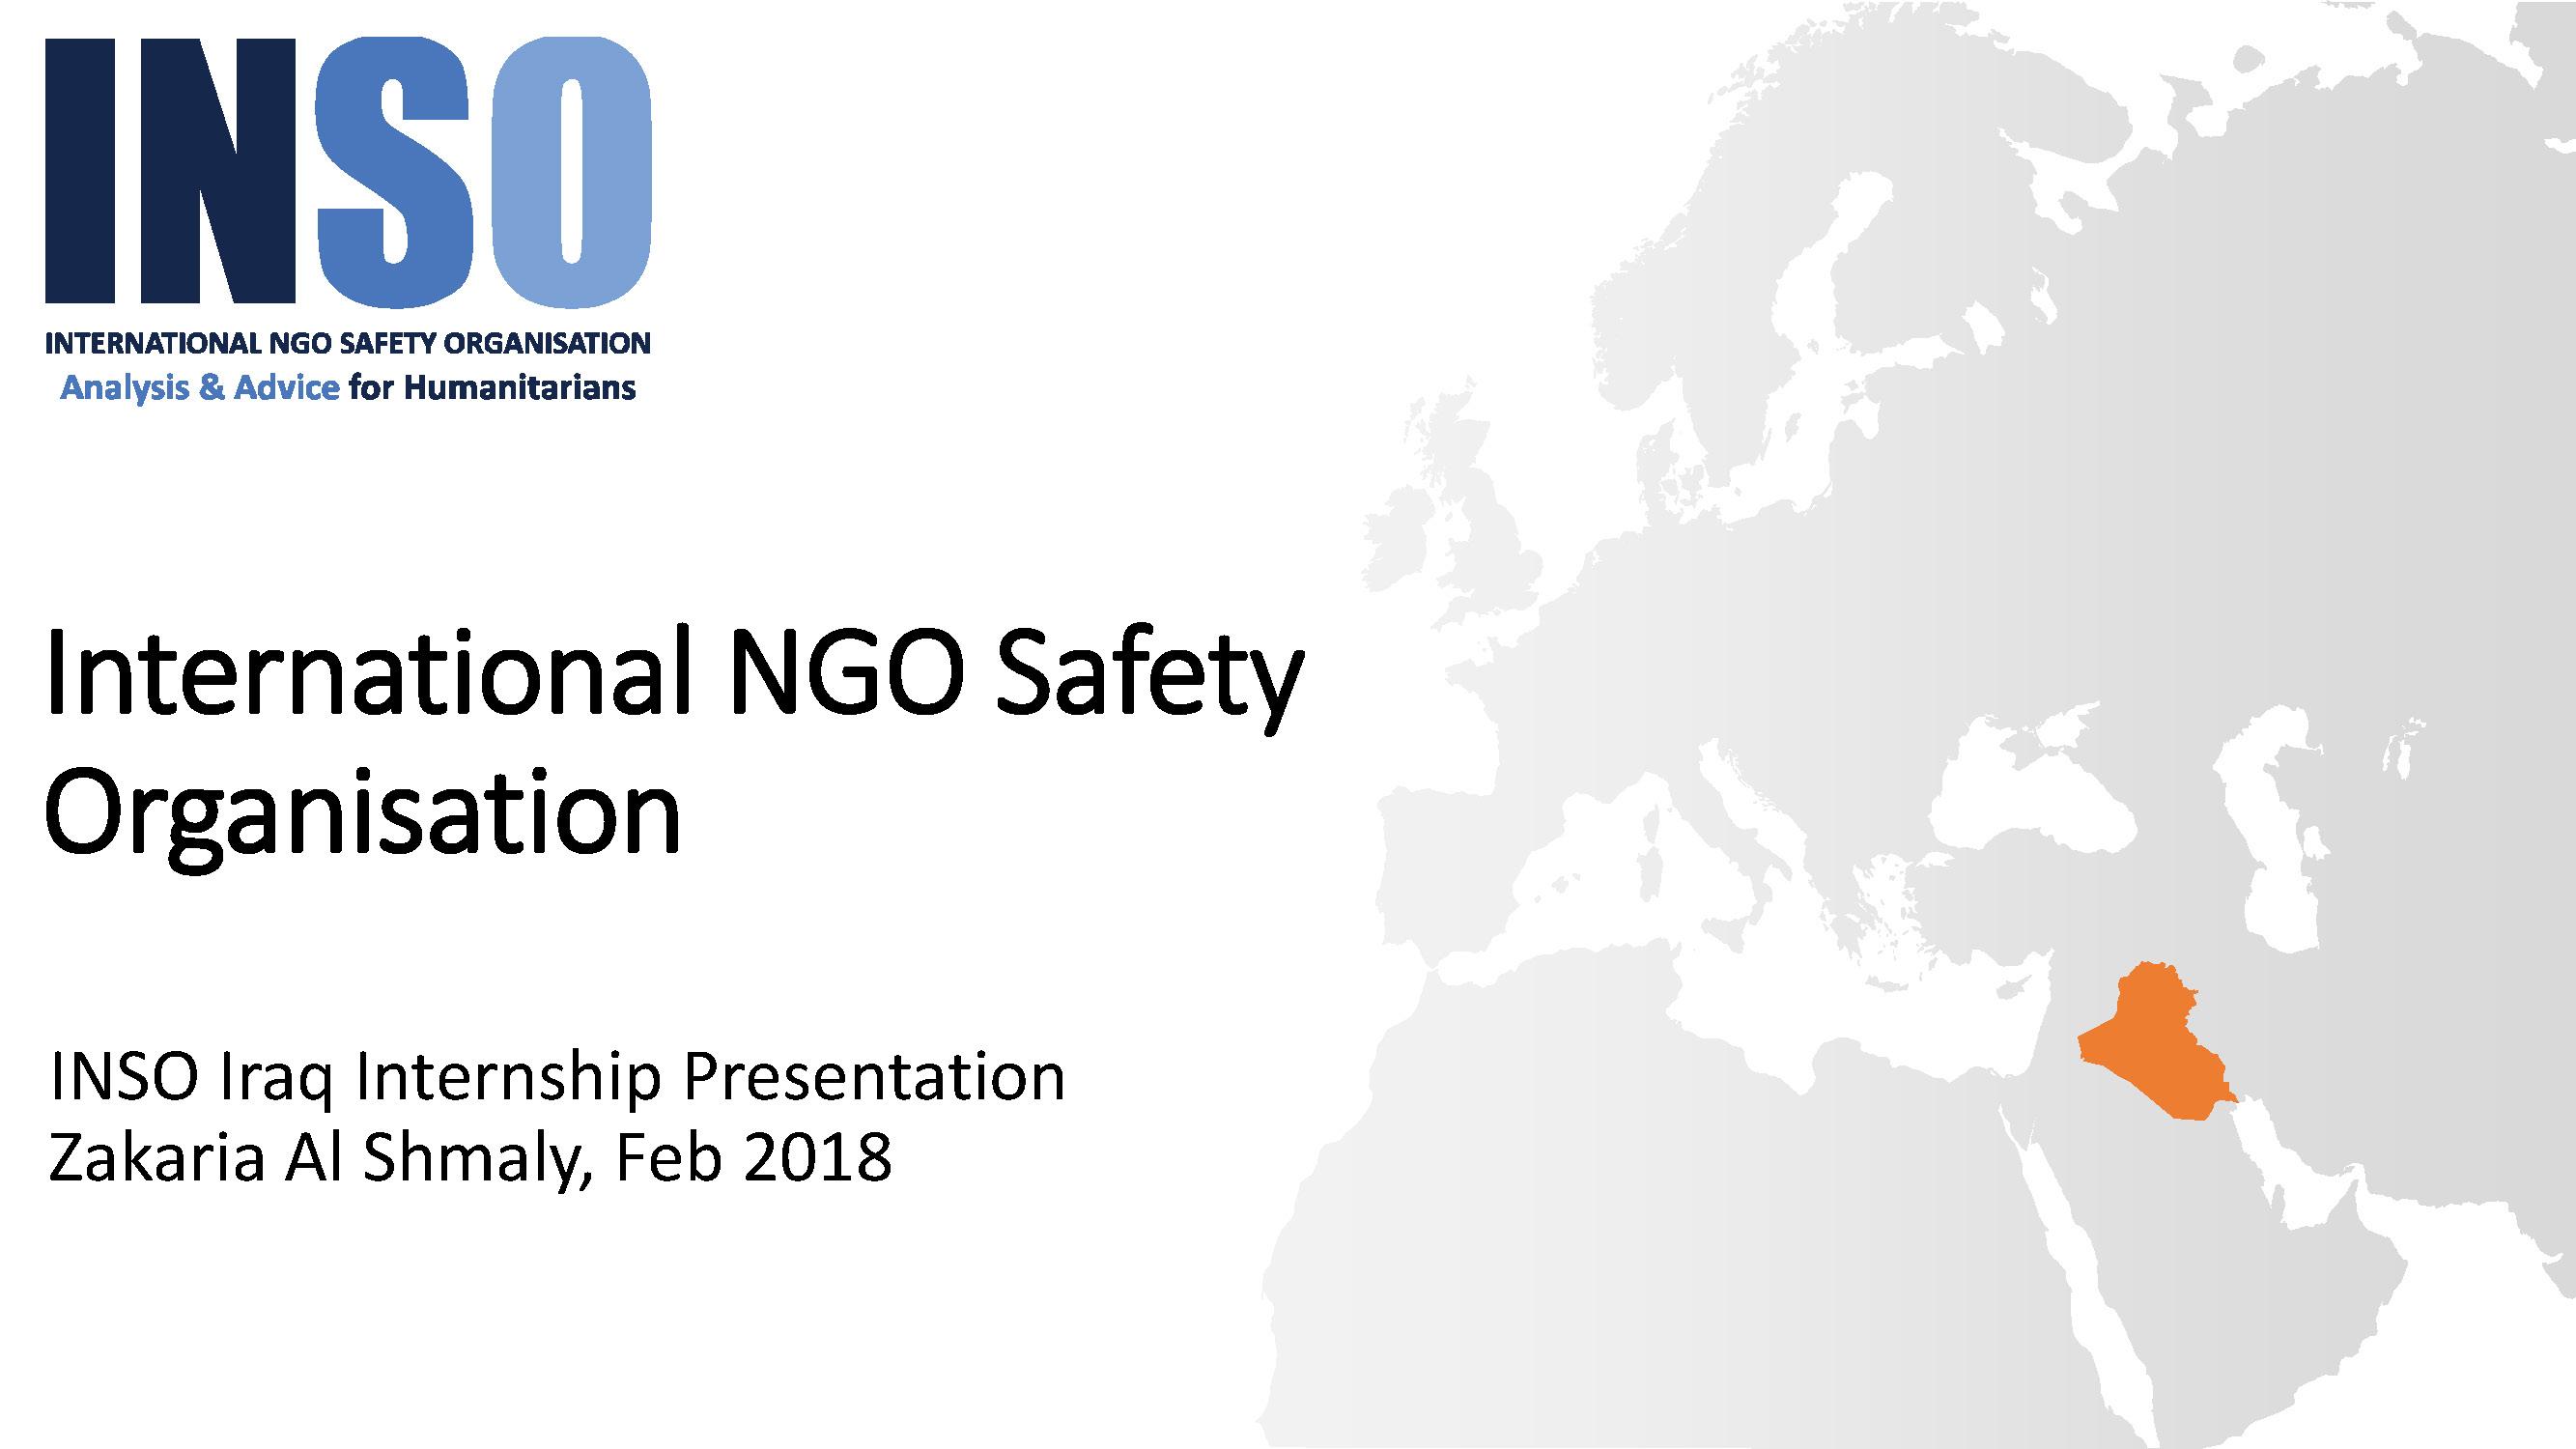 Z. Shmaly – International NGO Safety Organisation